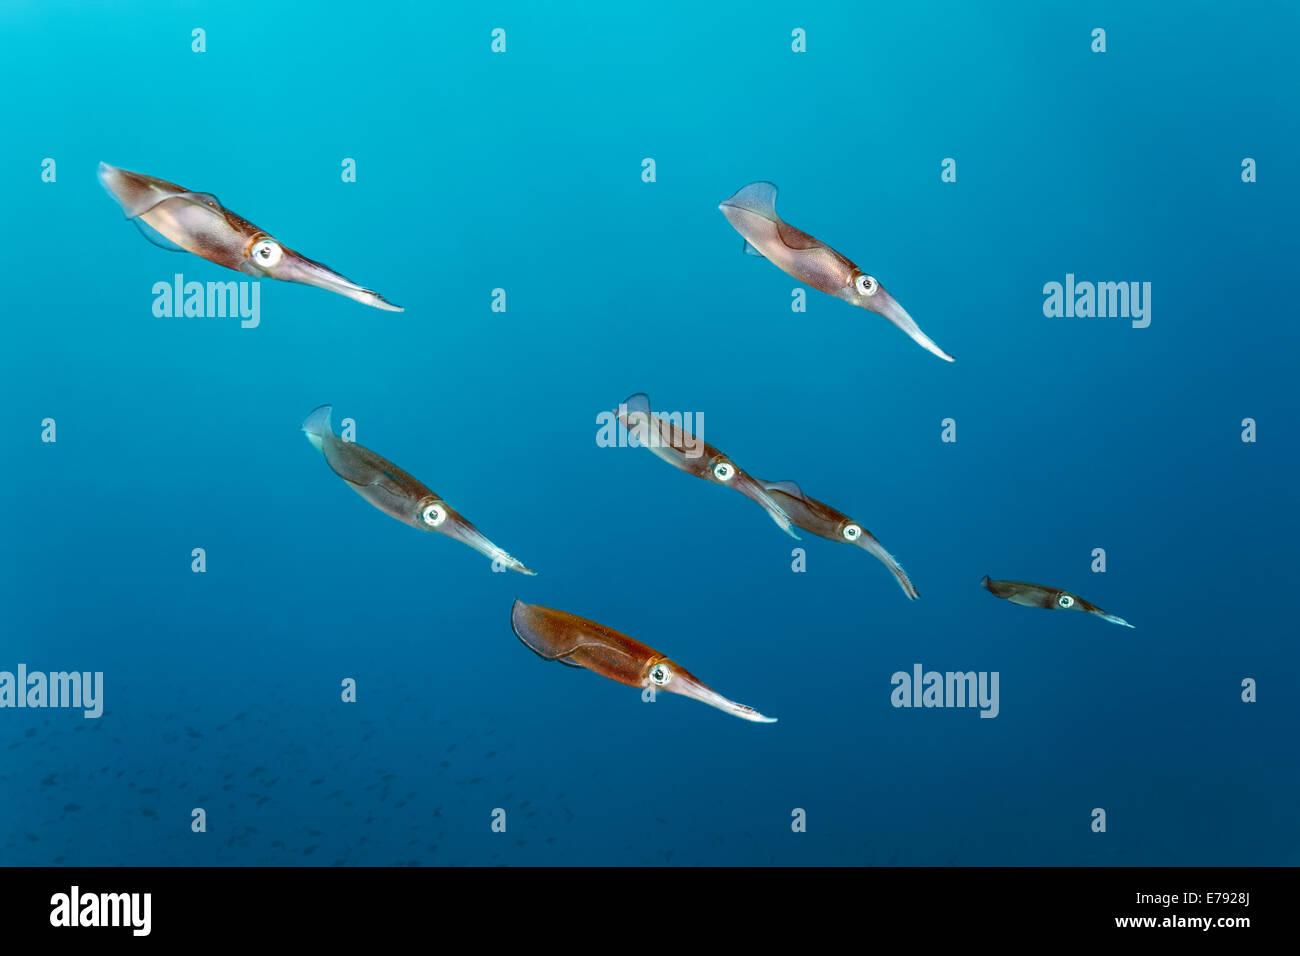 Bigfin reef squid (Sepioteuthis lessoniana), Dimaniyat Islands nature reserve, Al Batinah region, Oman - Stock Image